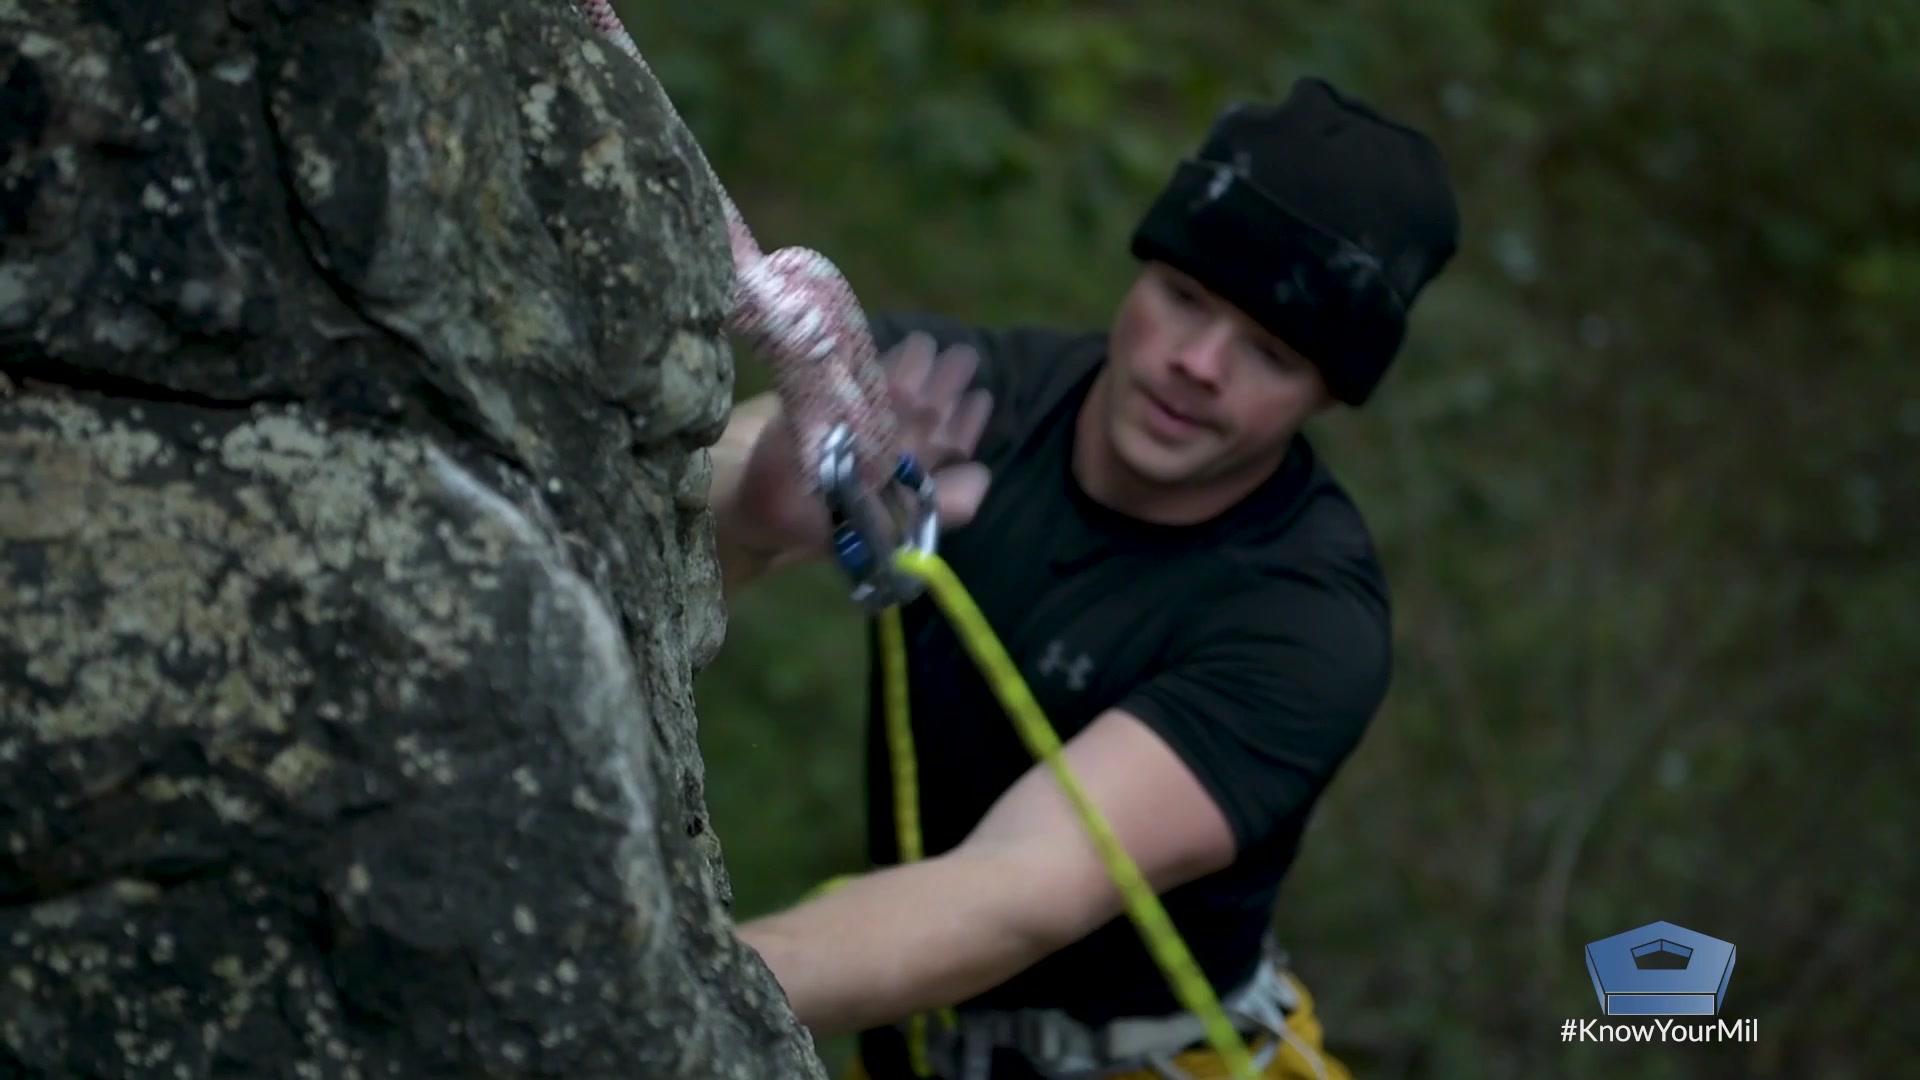 A service member rock climbs.